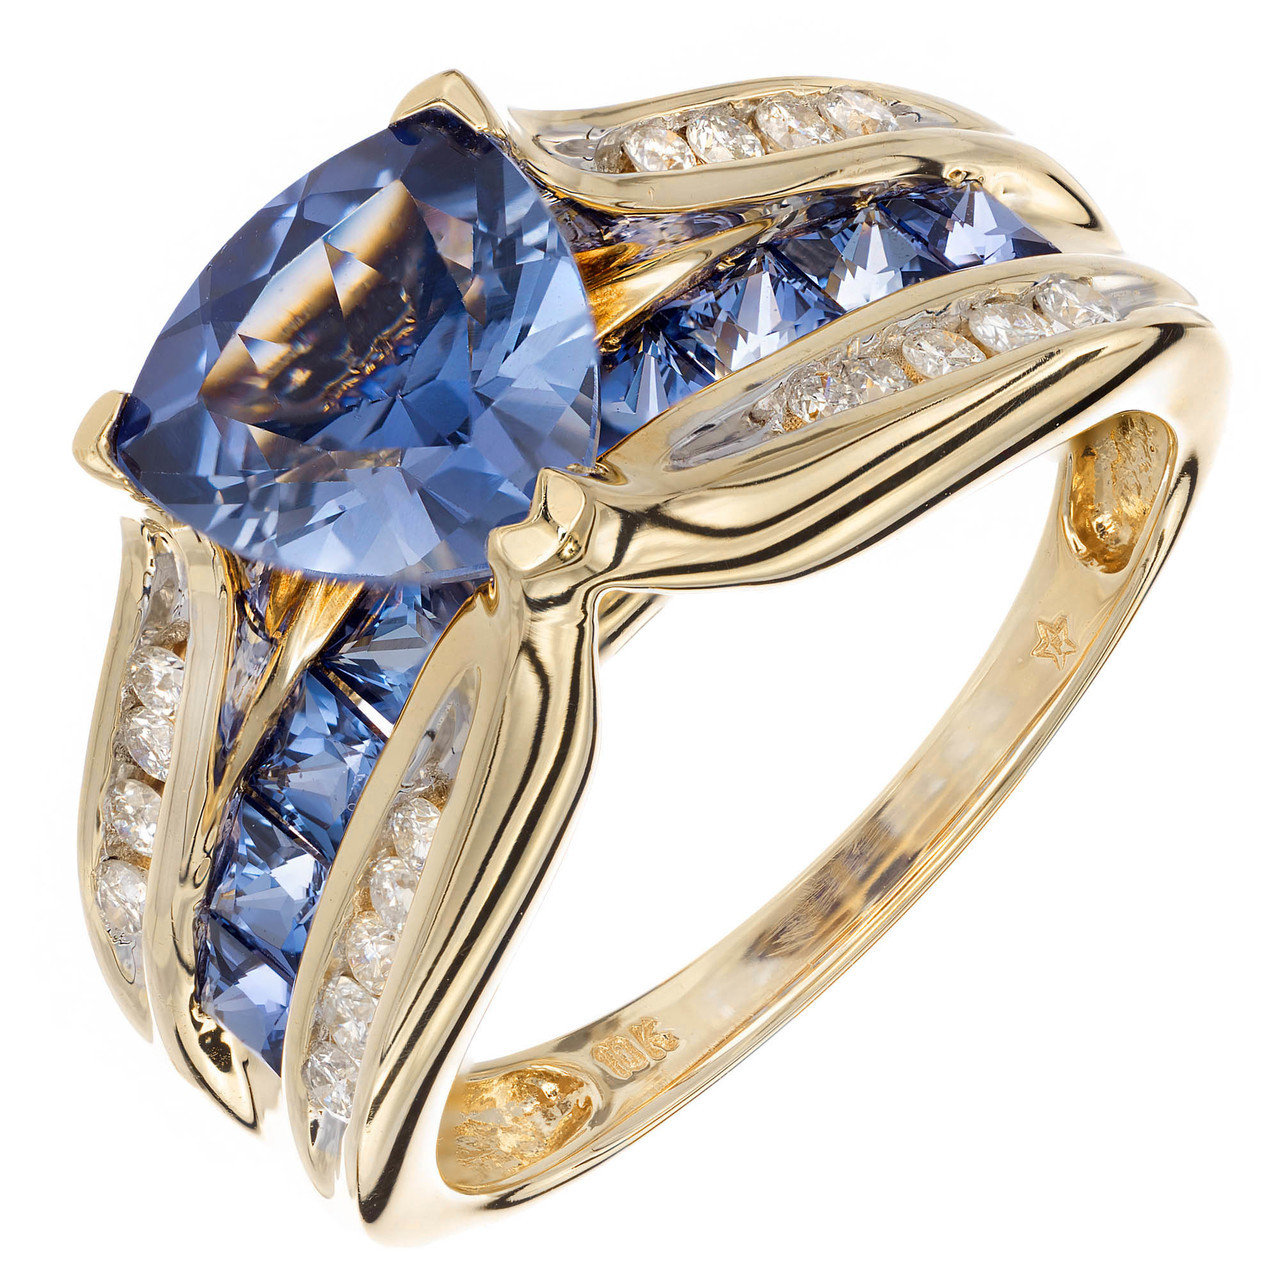 989f94861289f 1.54 Carat Tanzanite Diamond Yellow Gold Diamond Engagement Ring